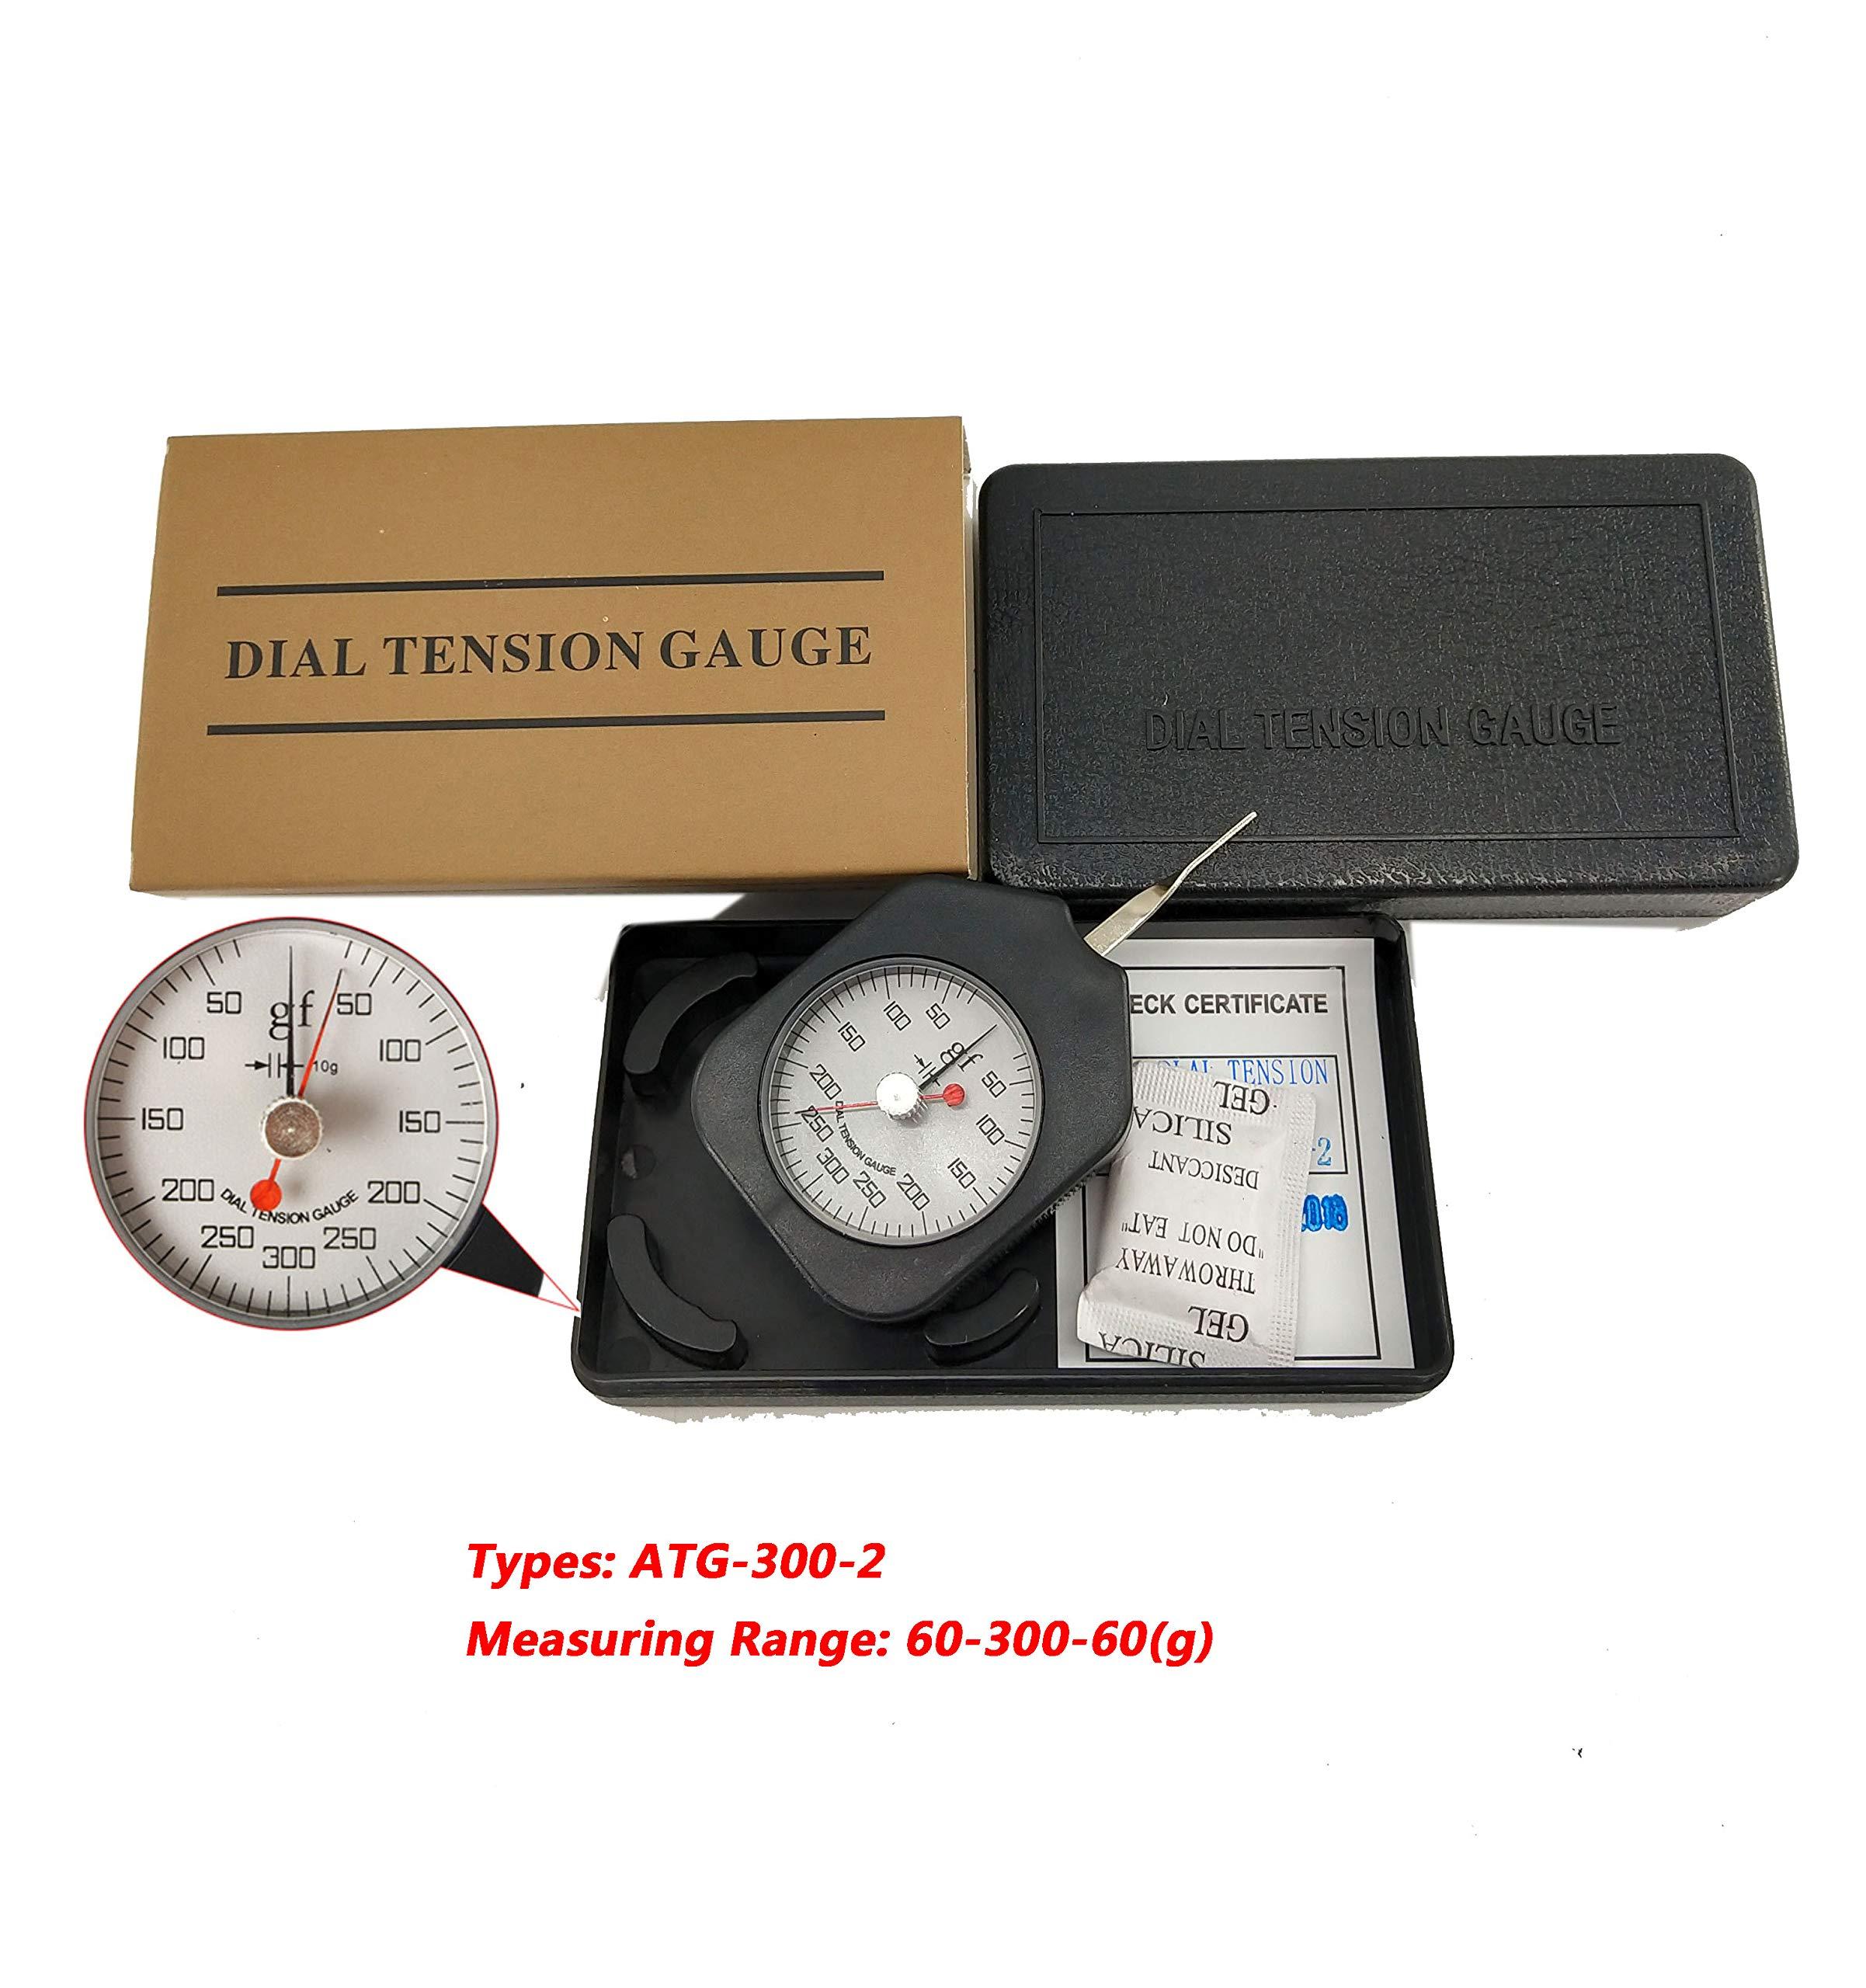 HFBTE ATG-300-2 Pocket Size Dial Tension Gauge Tester with Double Needle Meter Tensionmeter 60-300-60g Measuring Range by HFBTE